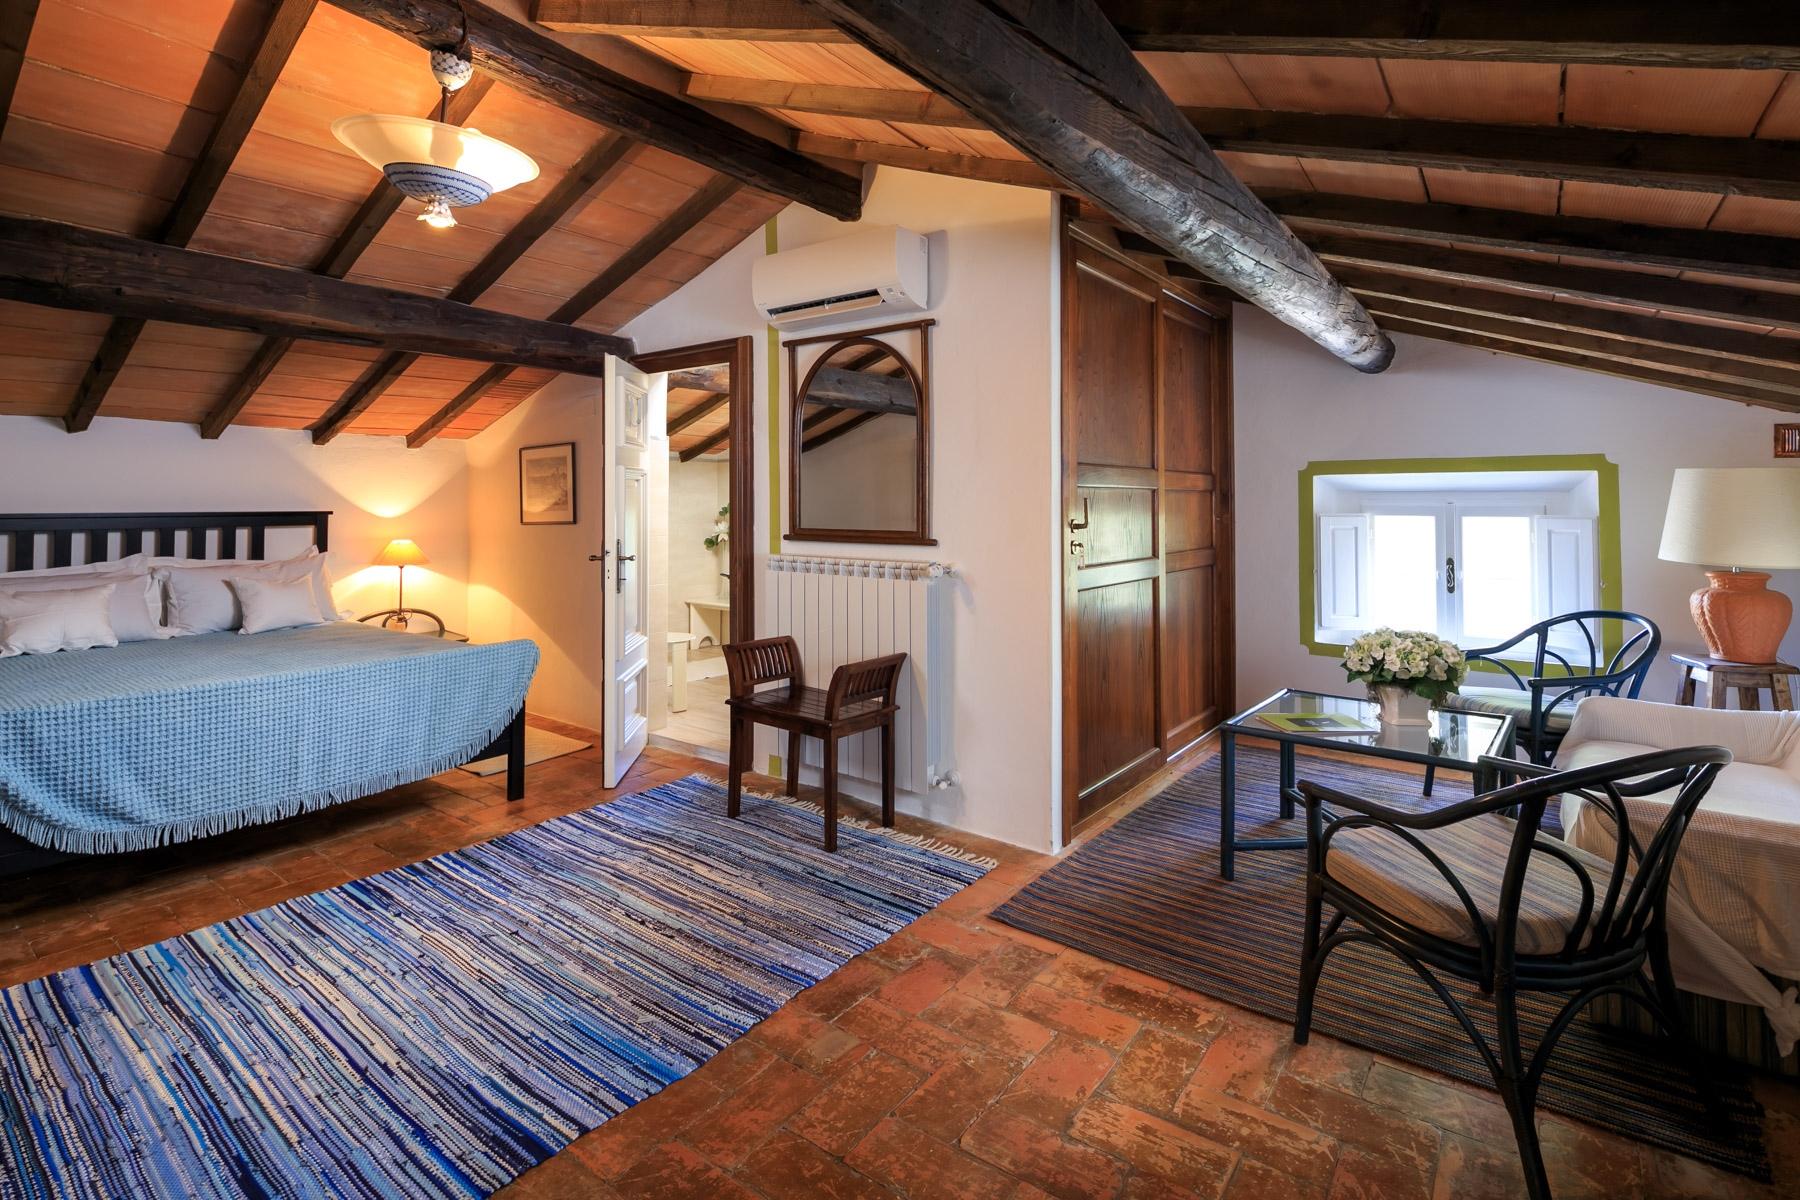 Villa in Vendita a Campiglia Marittima: 5 locali, 1100 mq - Foto 21